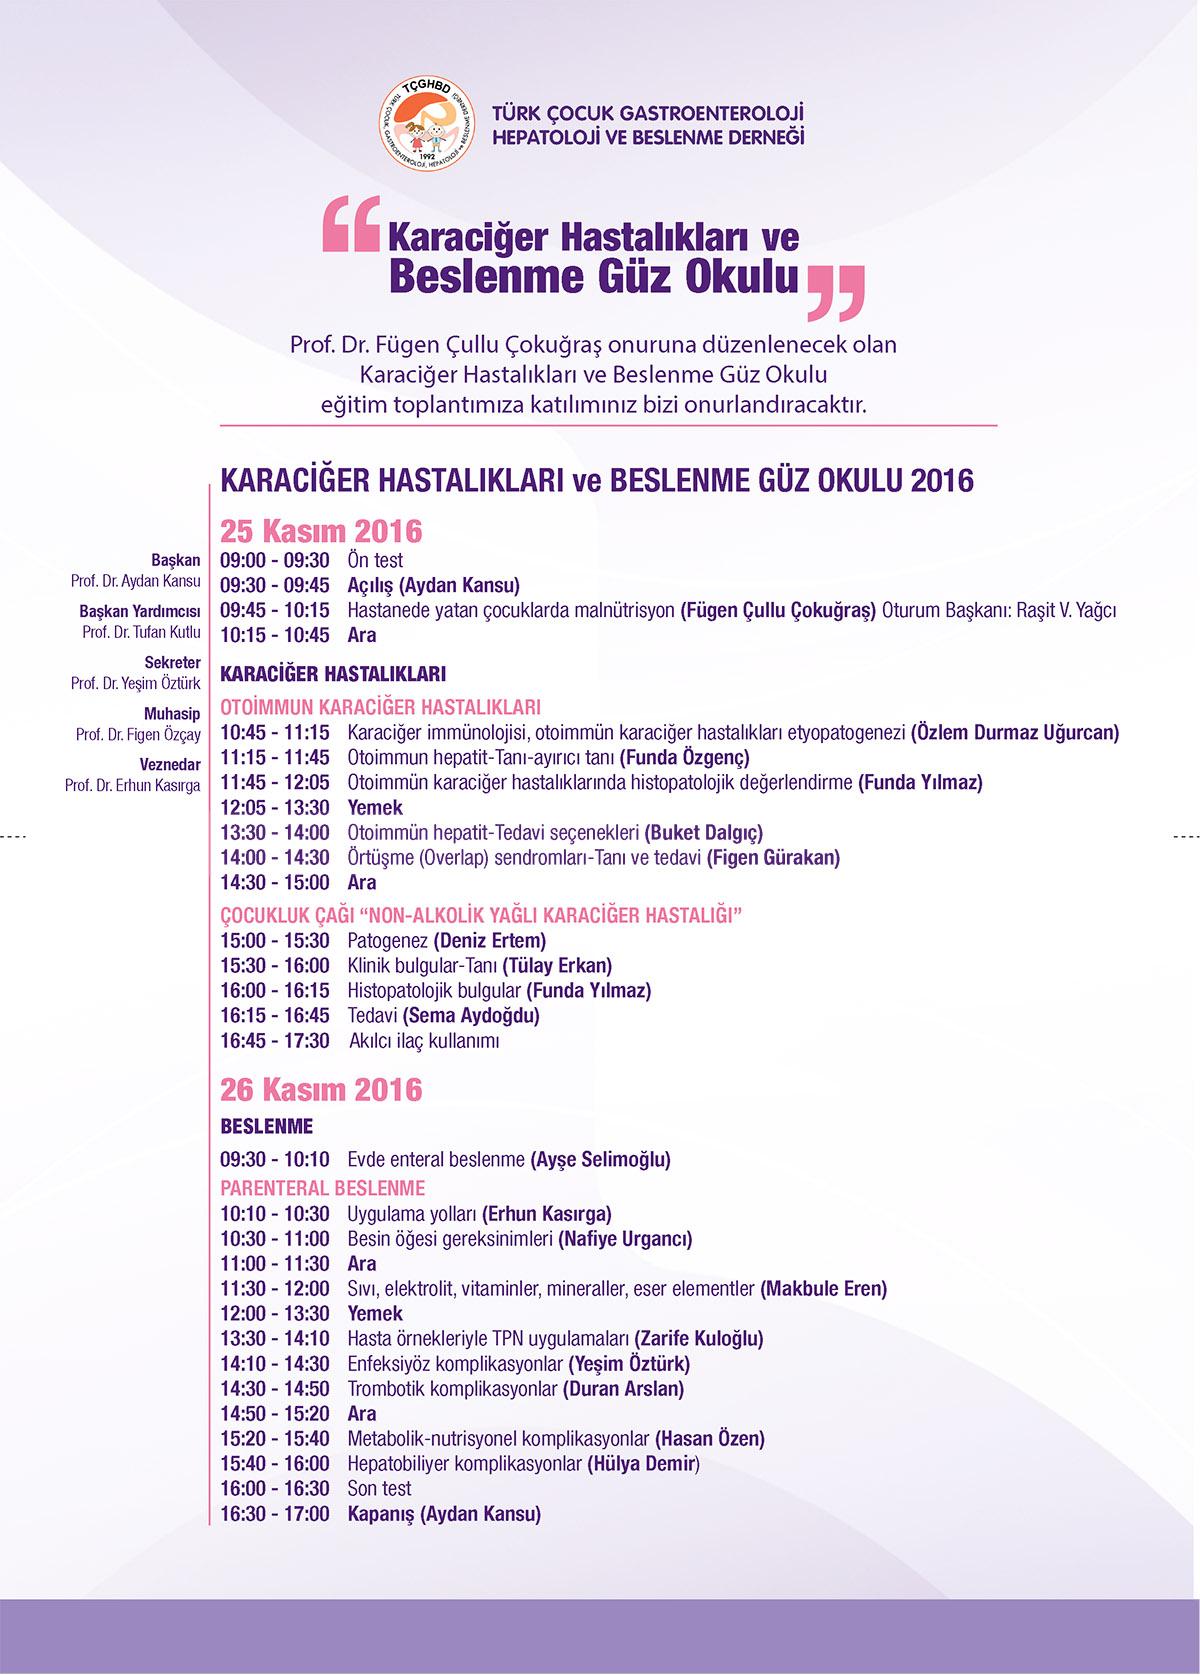 GASTRO_GUZ_OKULU2016